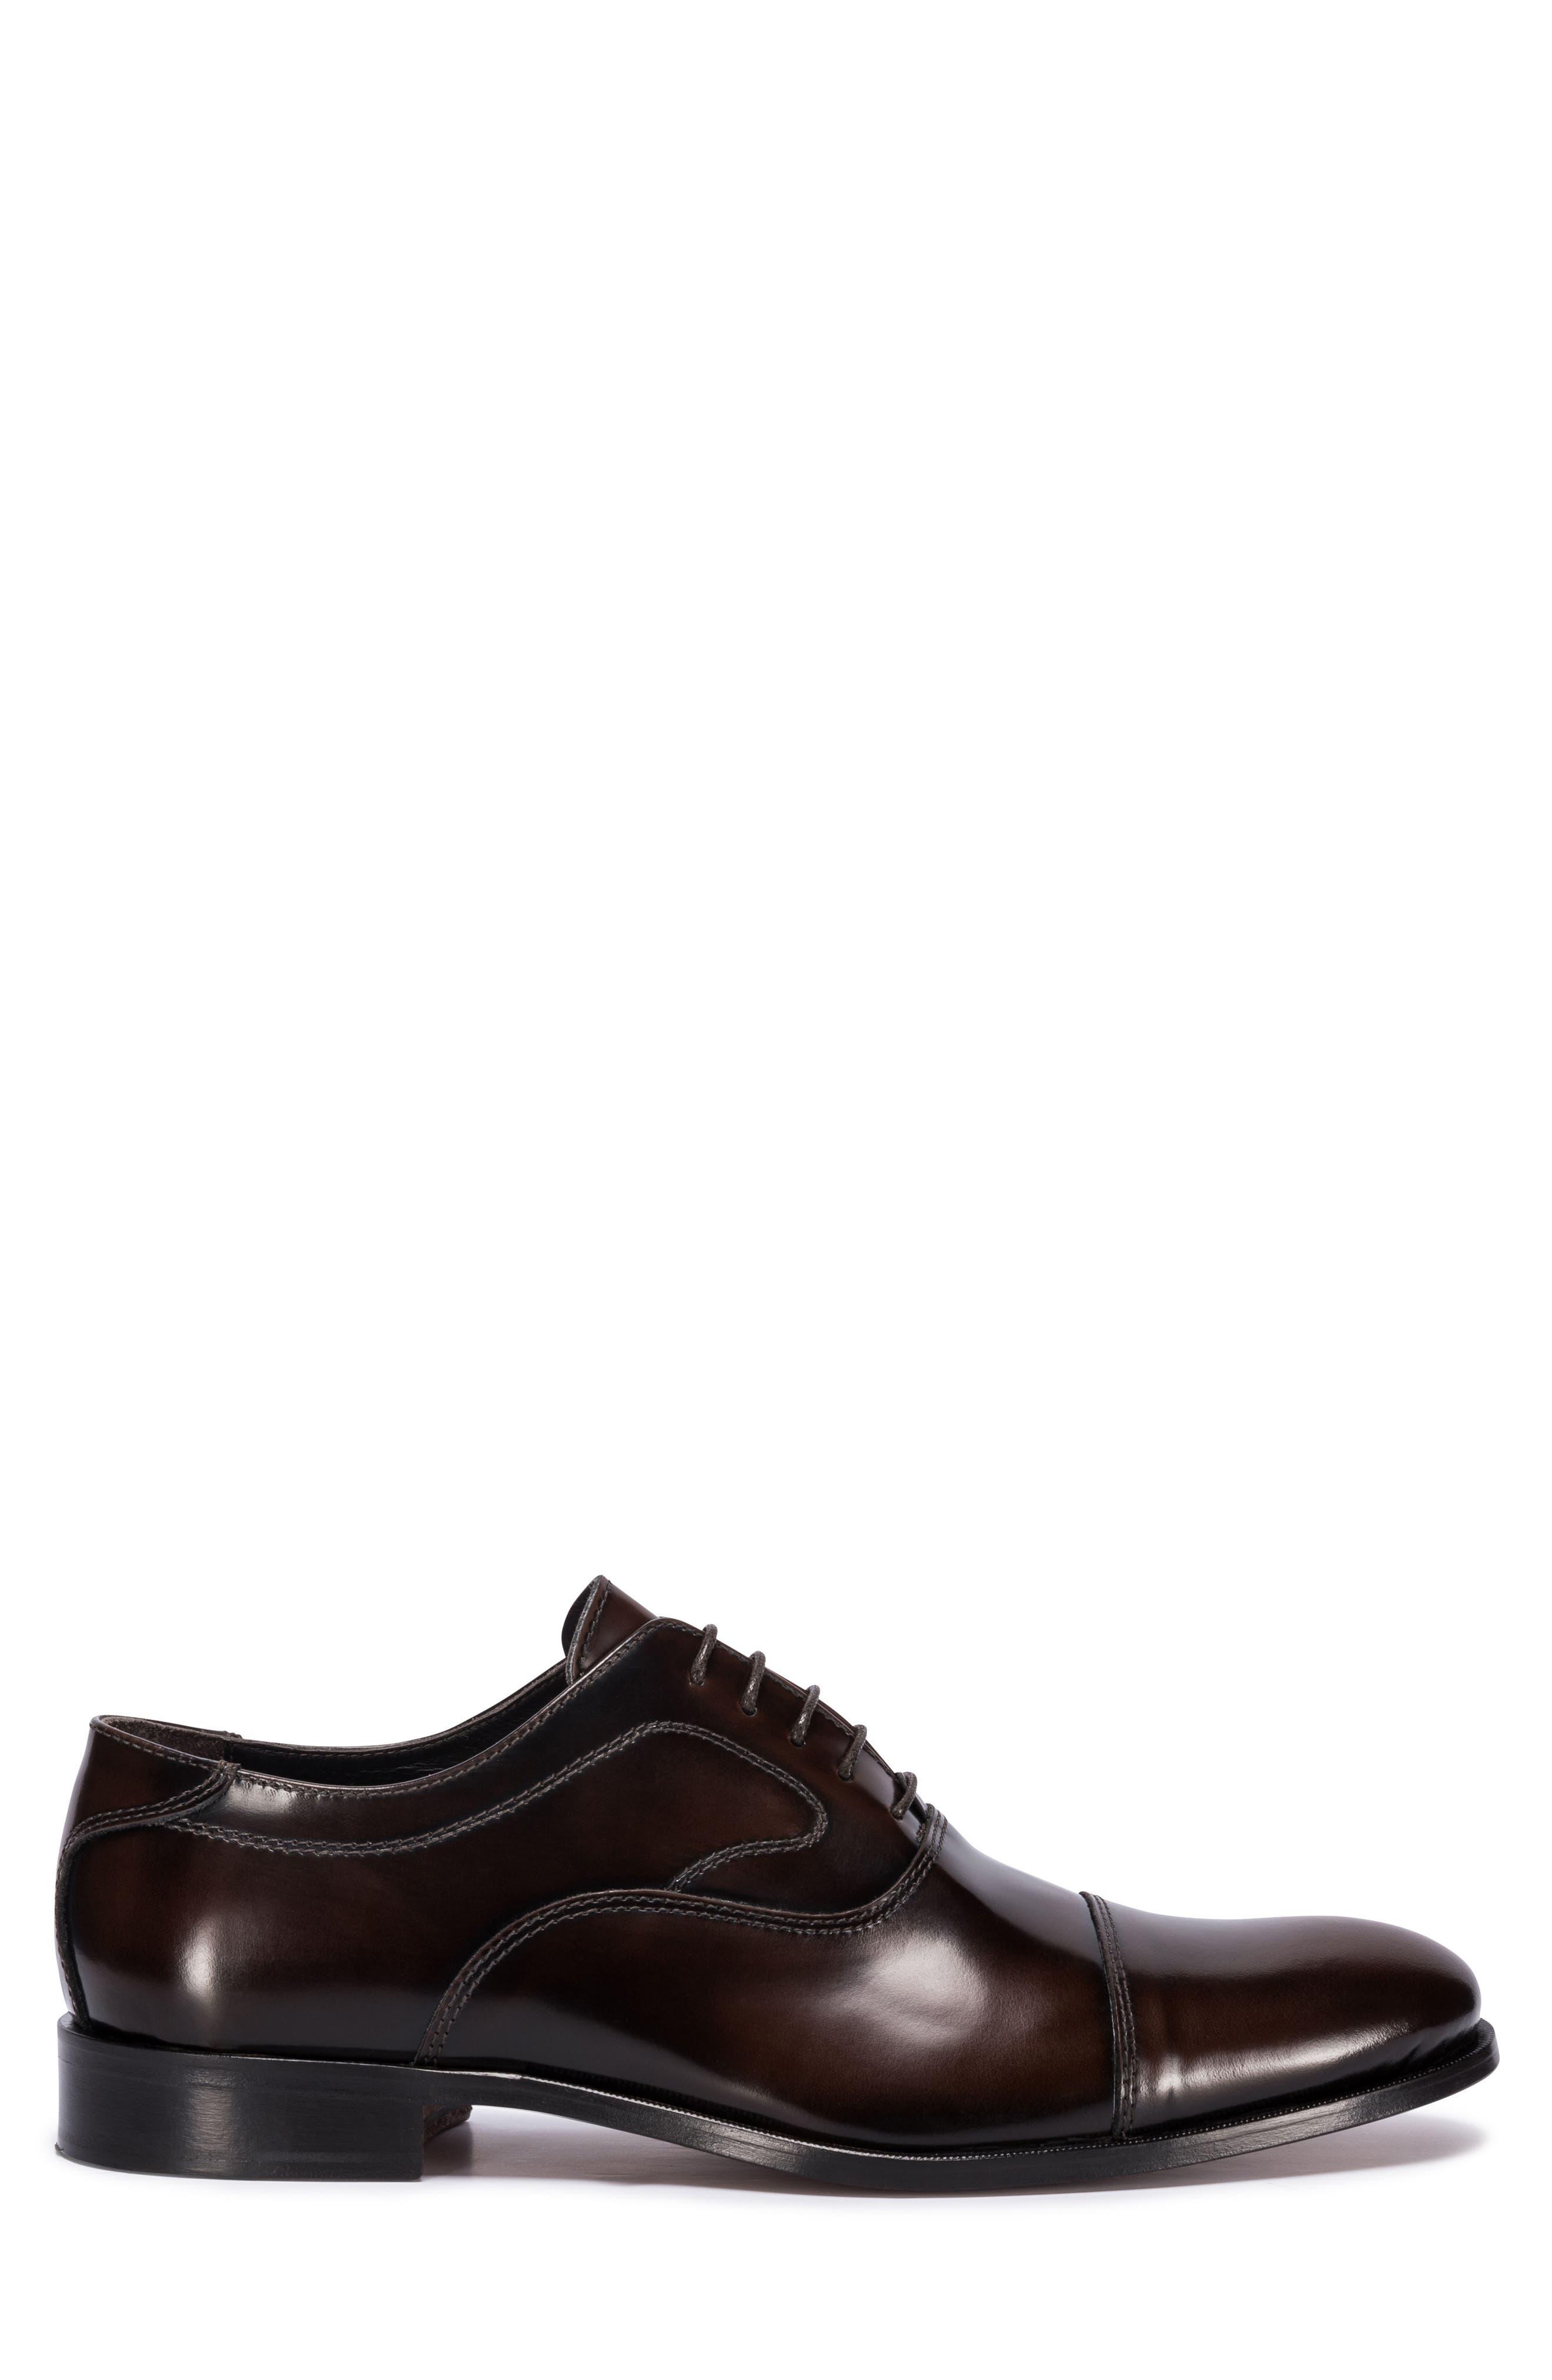 Garda Cap Toe Oxford,                             Alternate thumbnail 3, color,                             Brown Leather